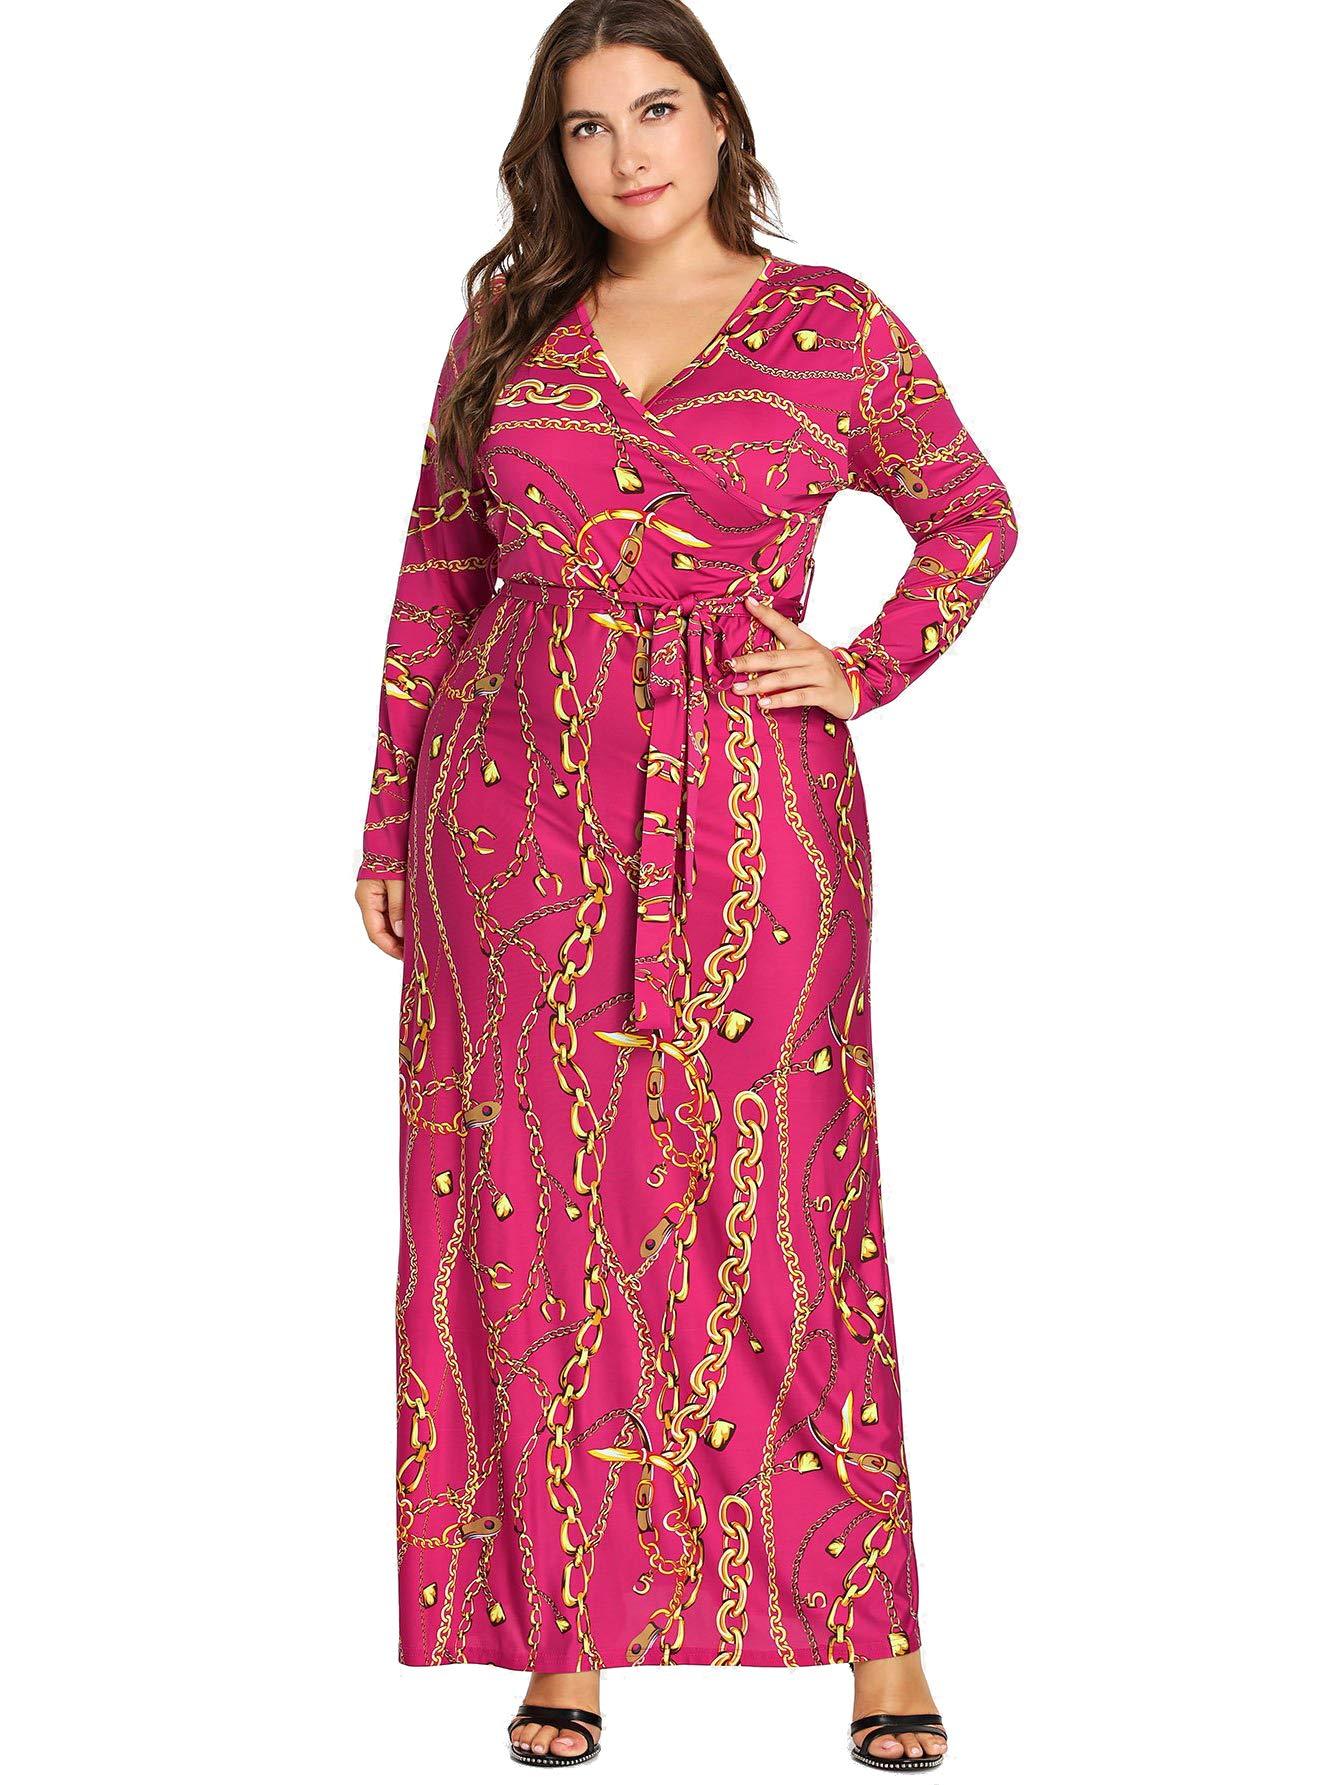 Milumia Plus Size Maxi Floor Length Wrap Empire Waist Boho Floral Flowy Dress